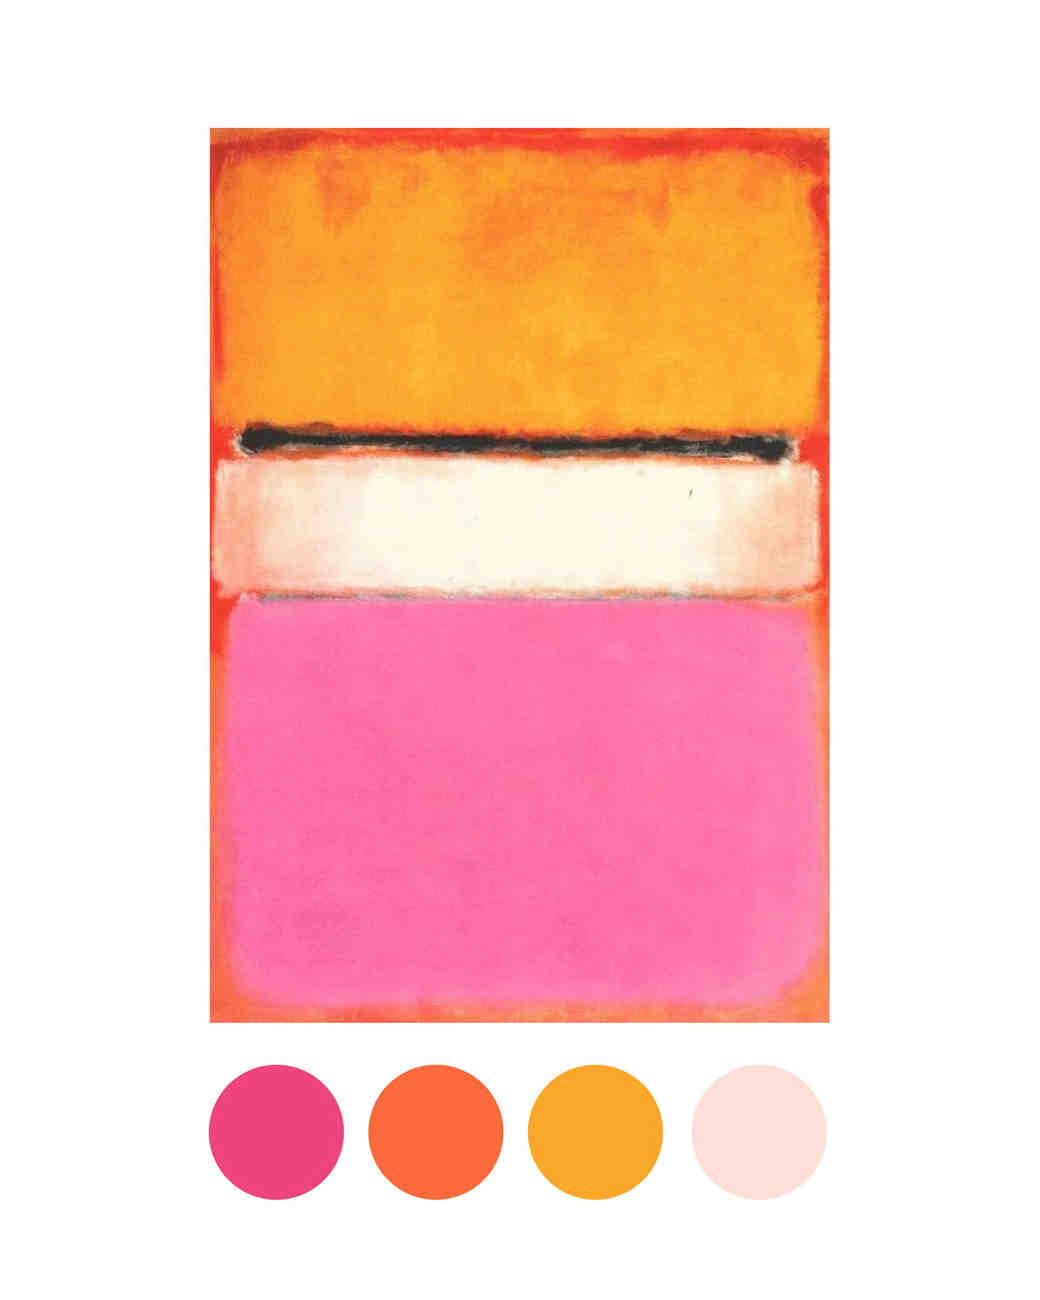 Congenial Citrus Shades Wedding Color Palettes Inspired By Art Martha Stewart G Color Palette Names G Color Palette Warframe inspiration Gold Color Palette